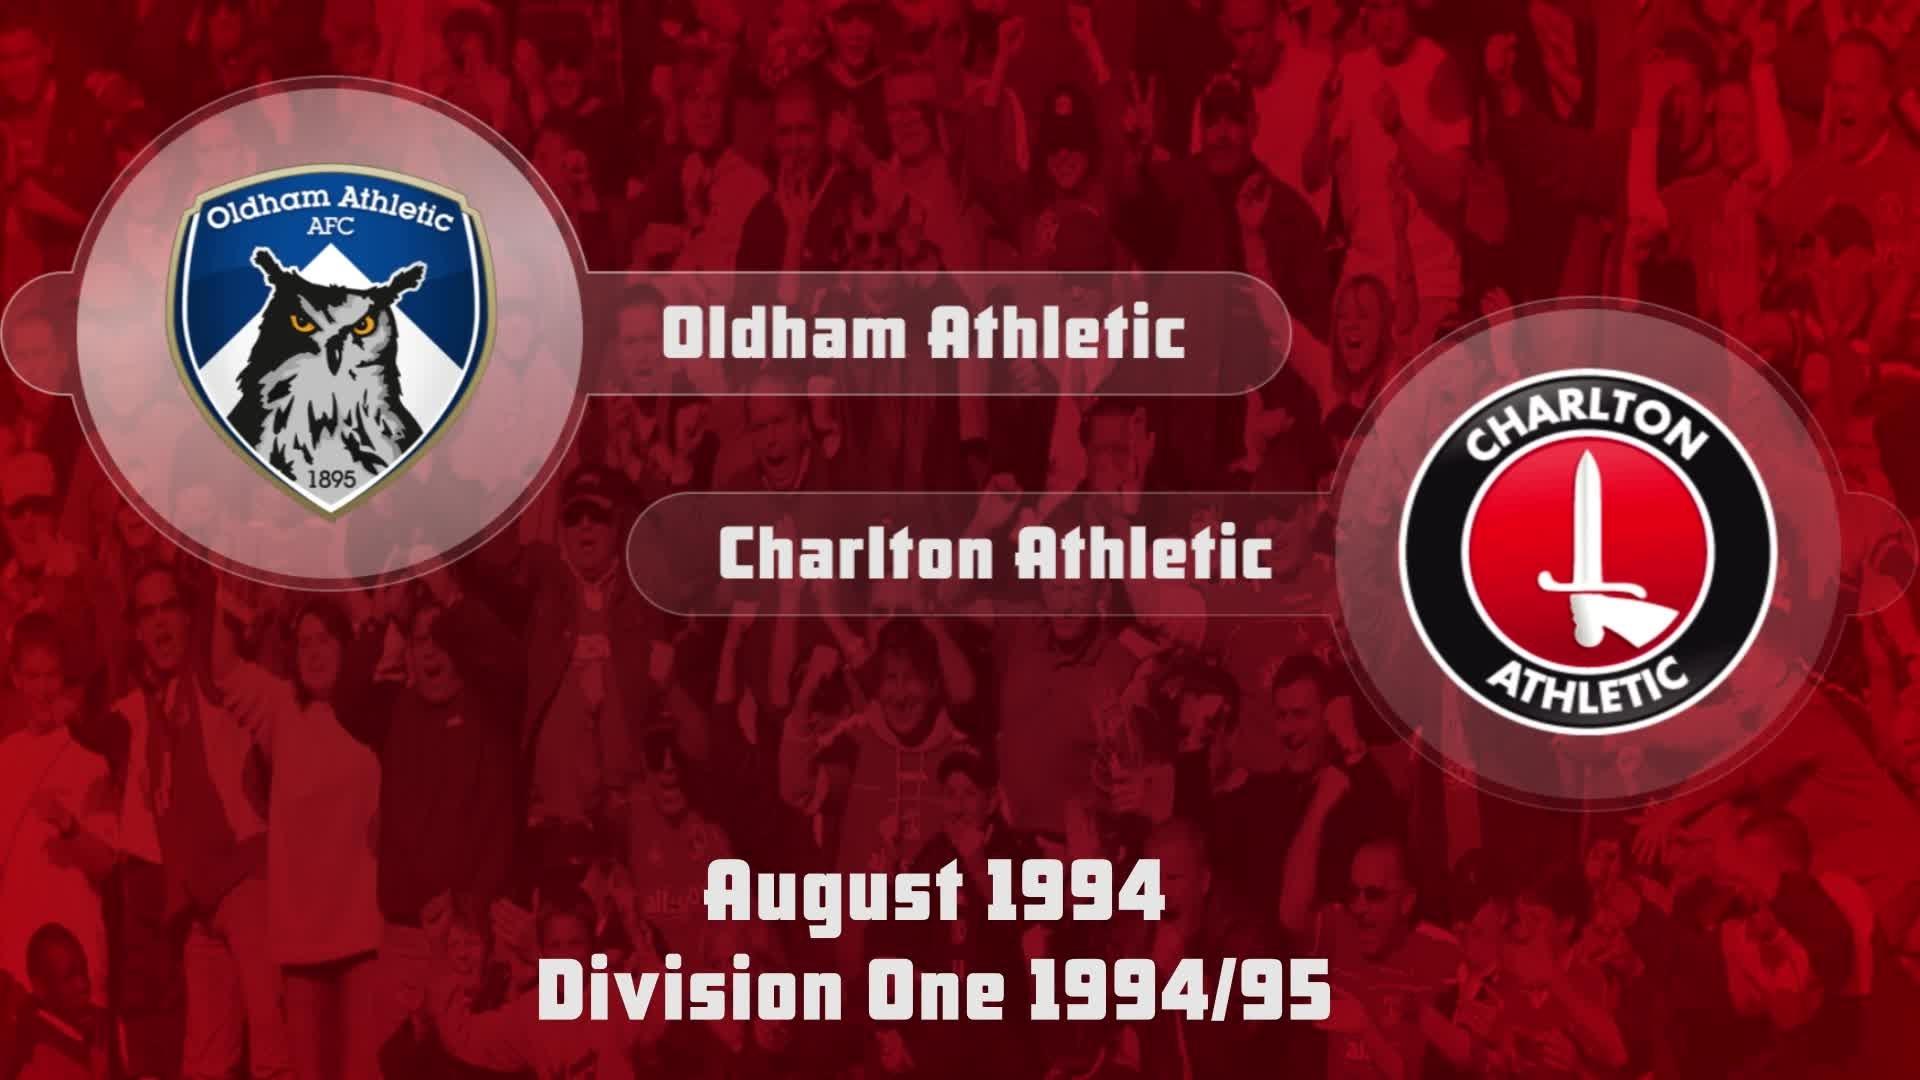 01 HIGHLIGHTS | Oldham 5 Charlton 2 (Aug 1994)